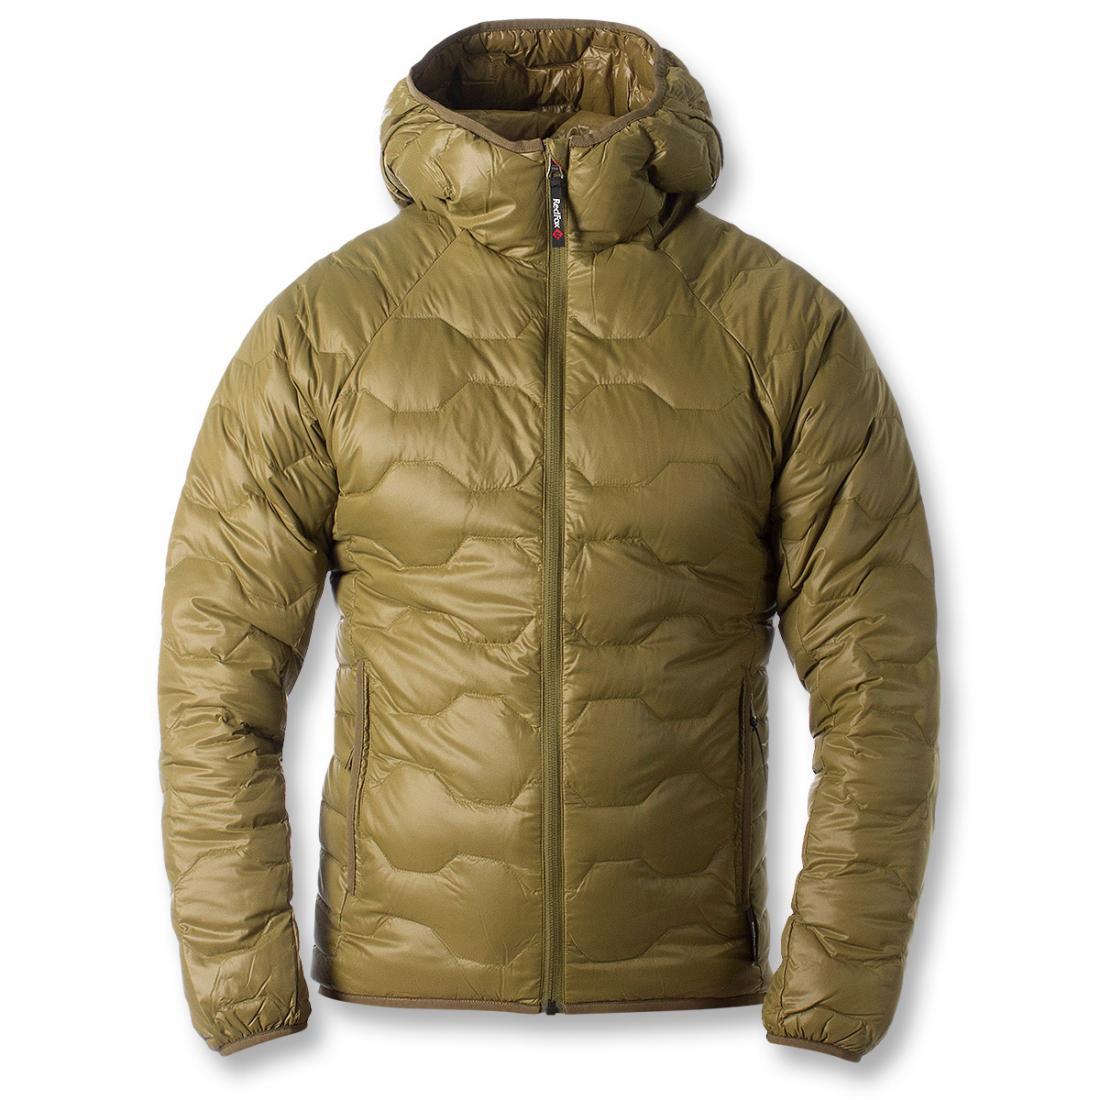 Куртка пуховая Belite III МужскаяКуртки<br><br><br>Цвет: Зеленый<br>Размер: 48